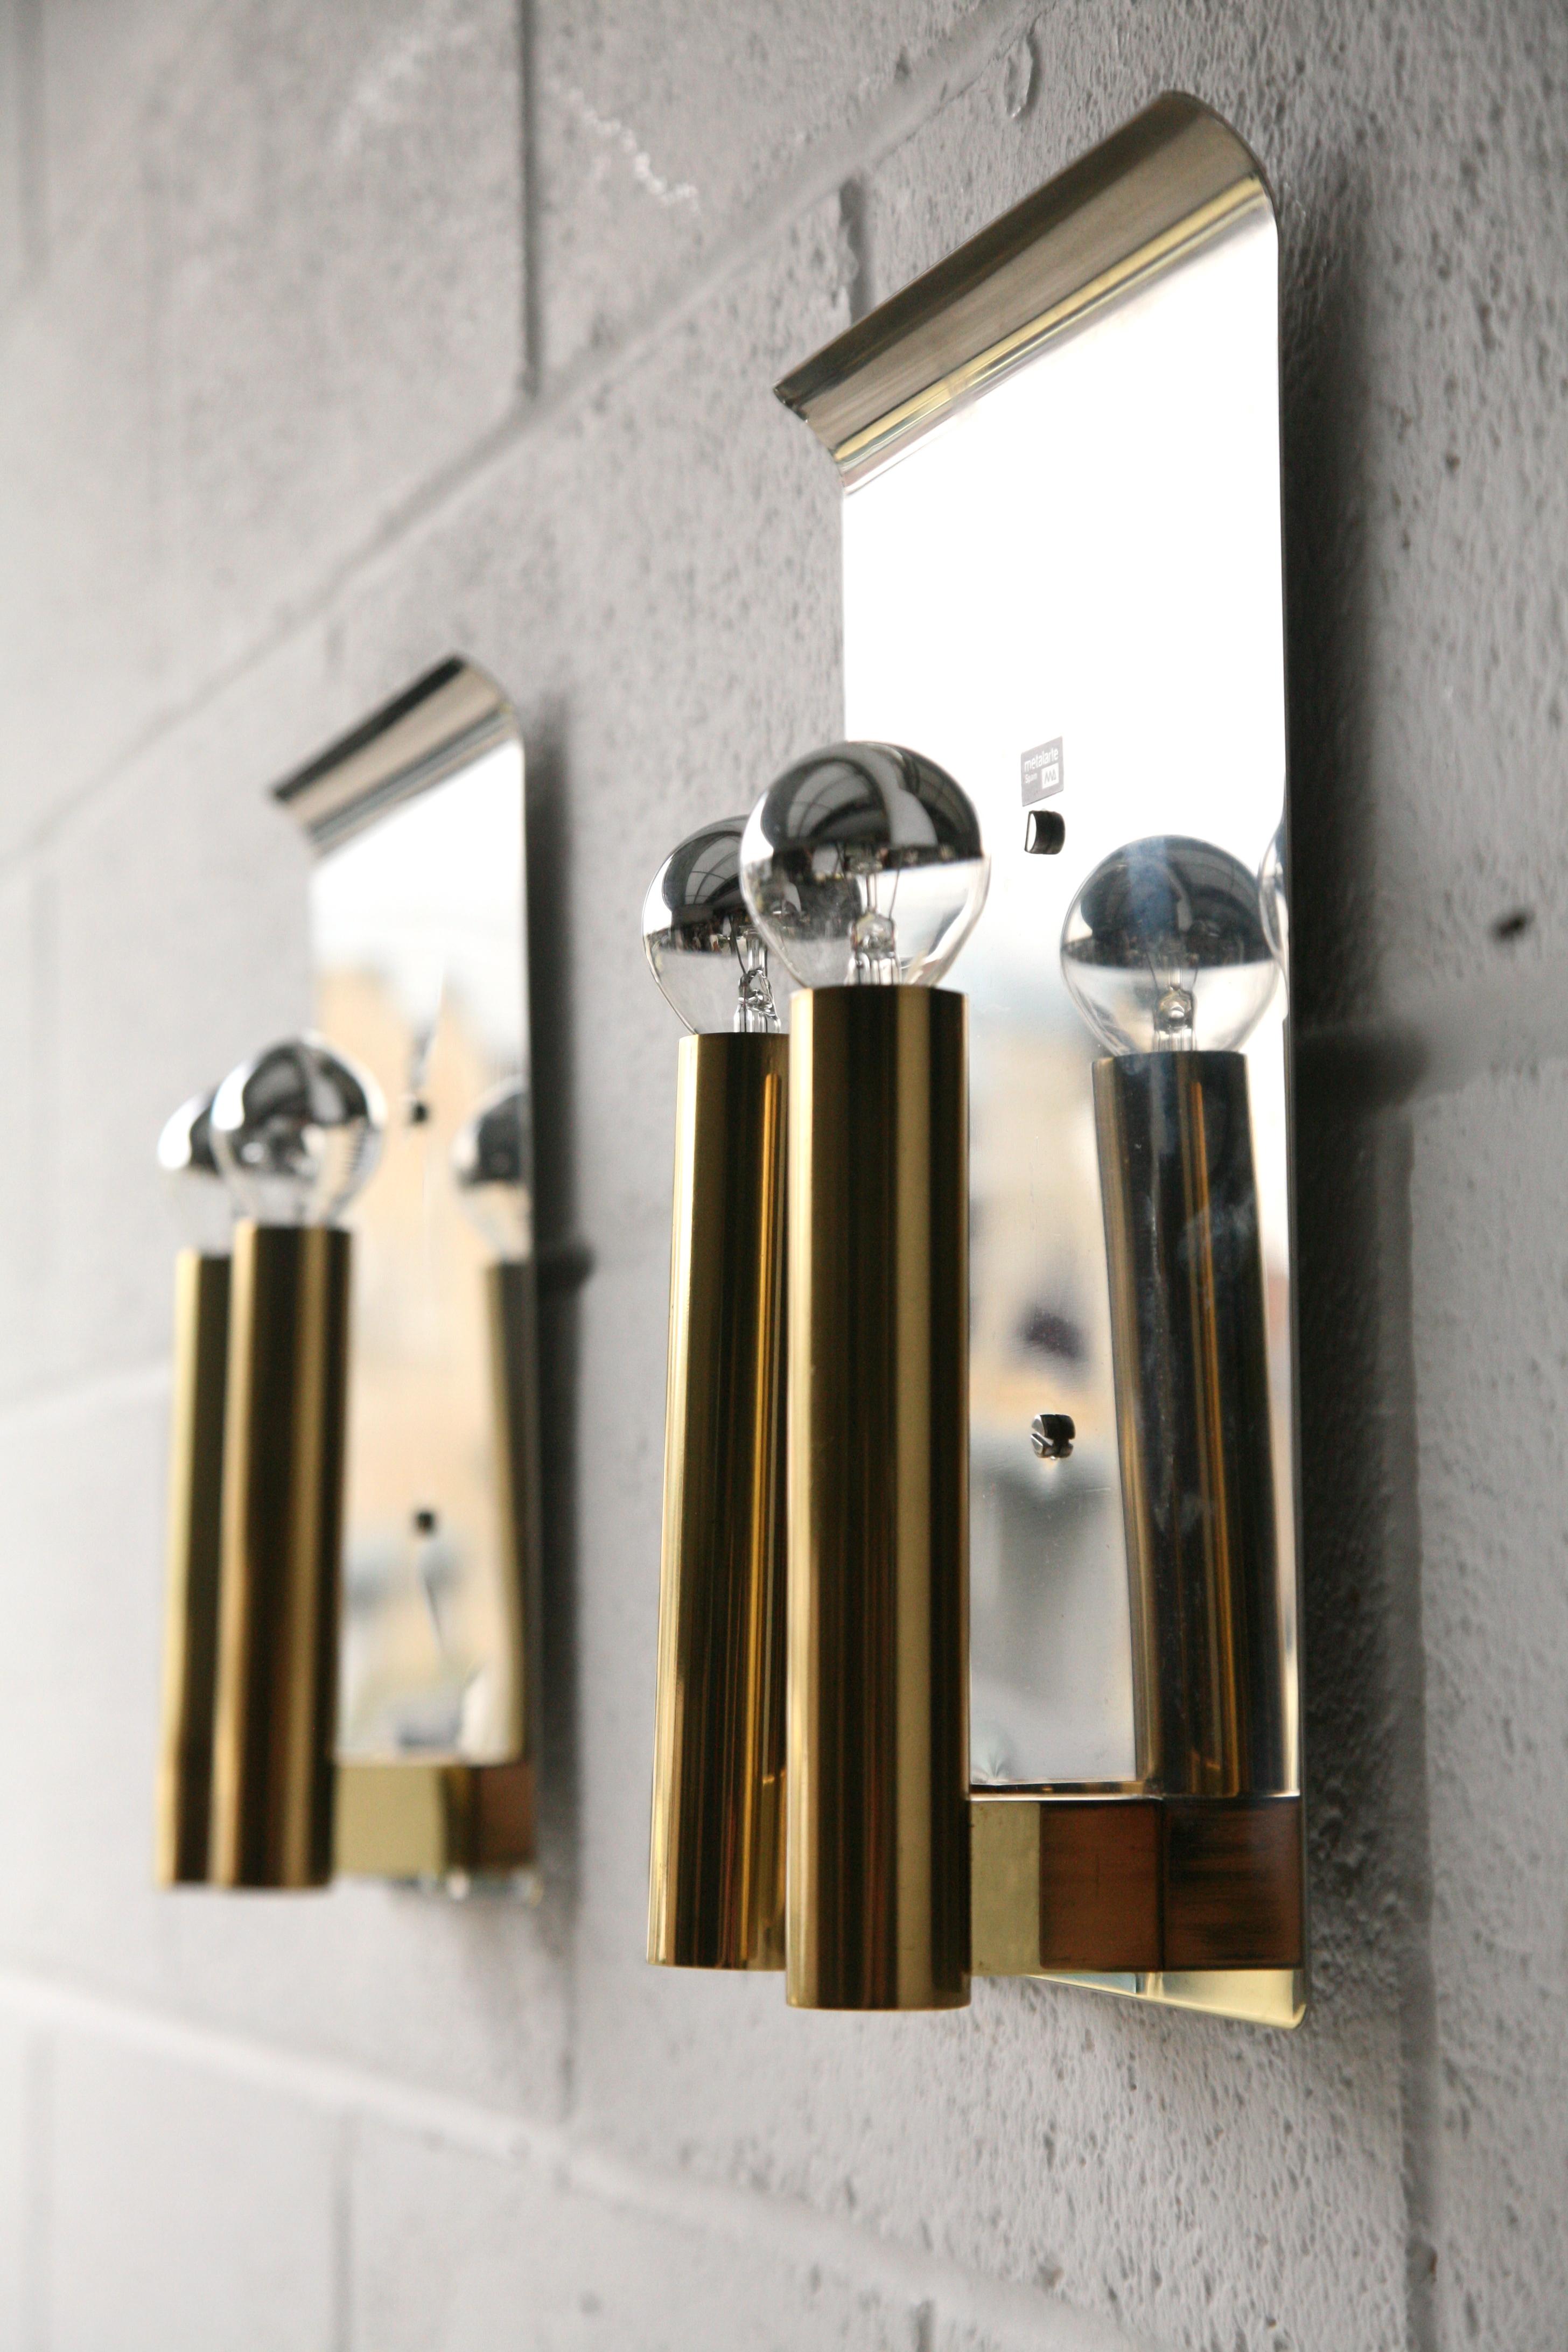 Chrome & Brass Wall Lights by Metalarte Spain 1